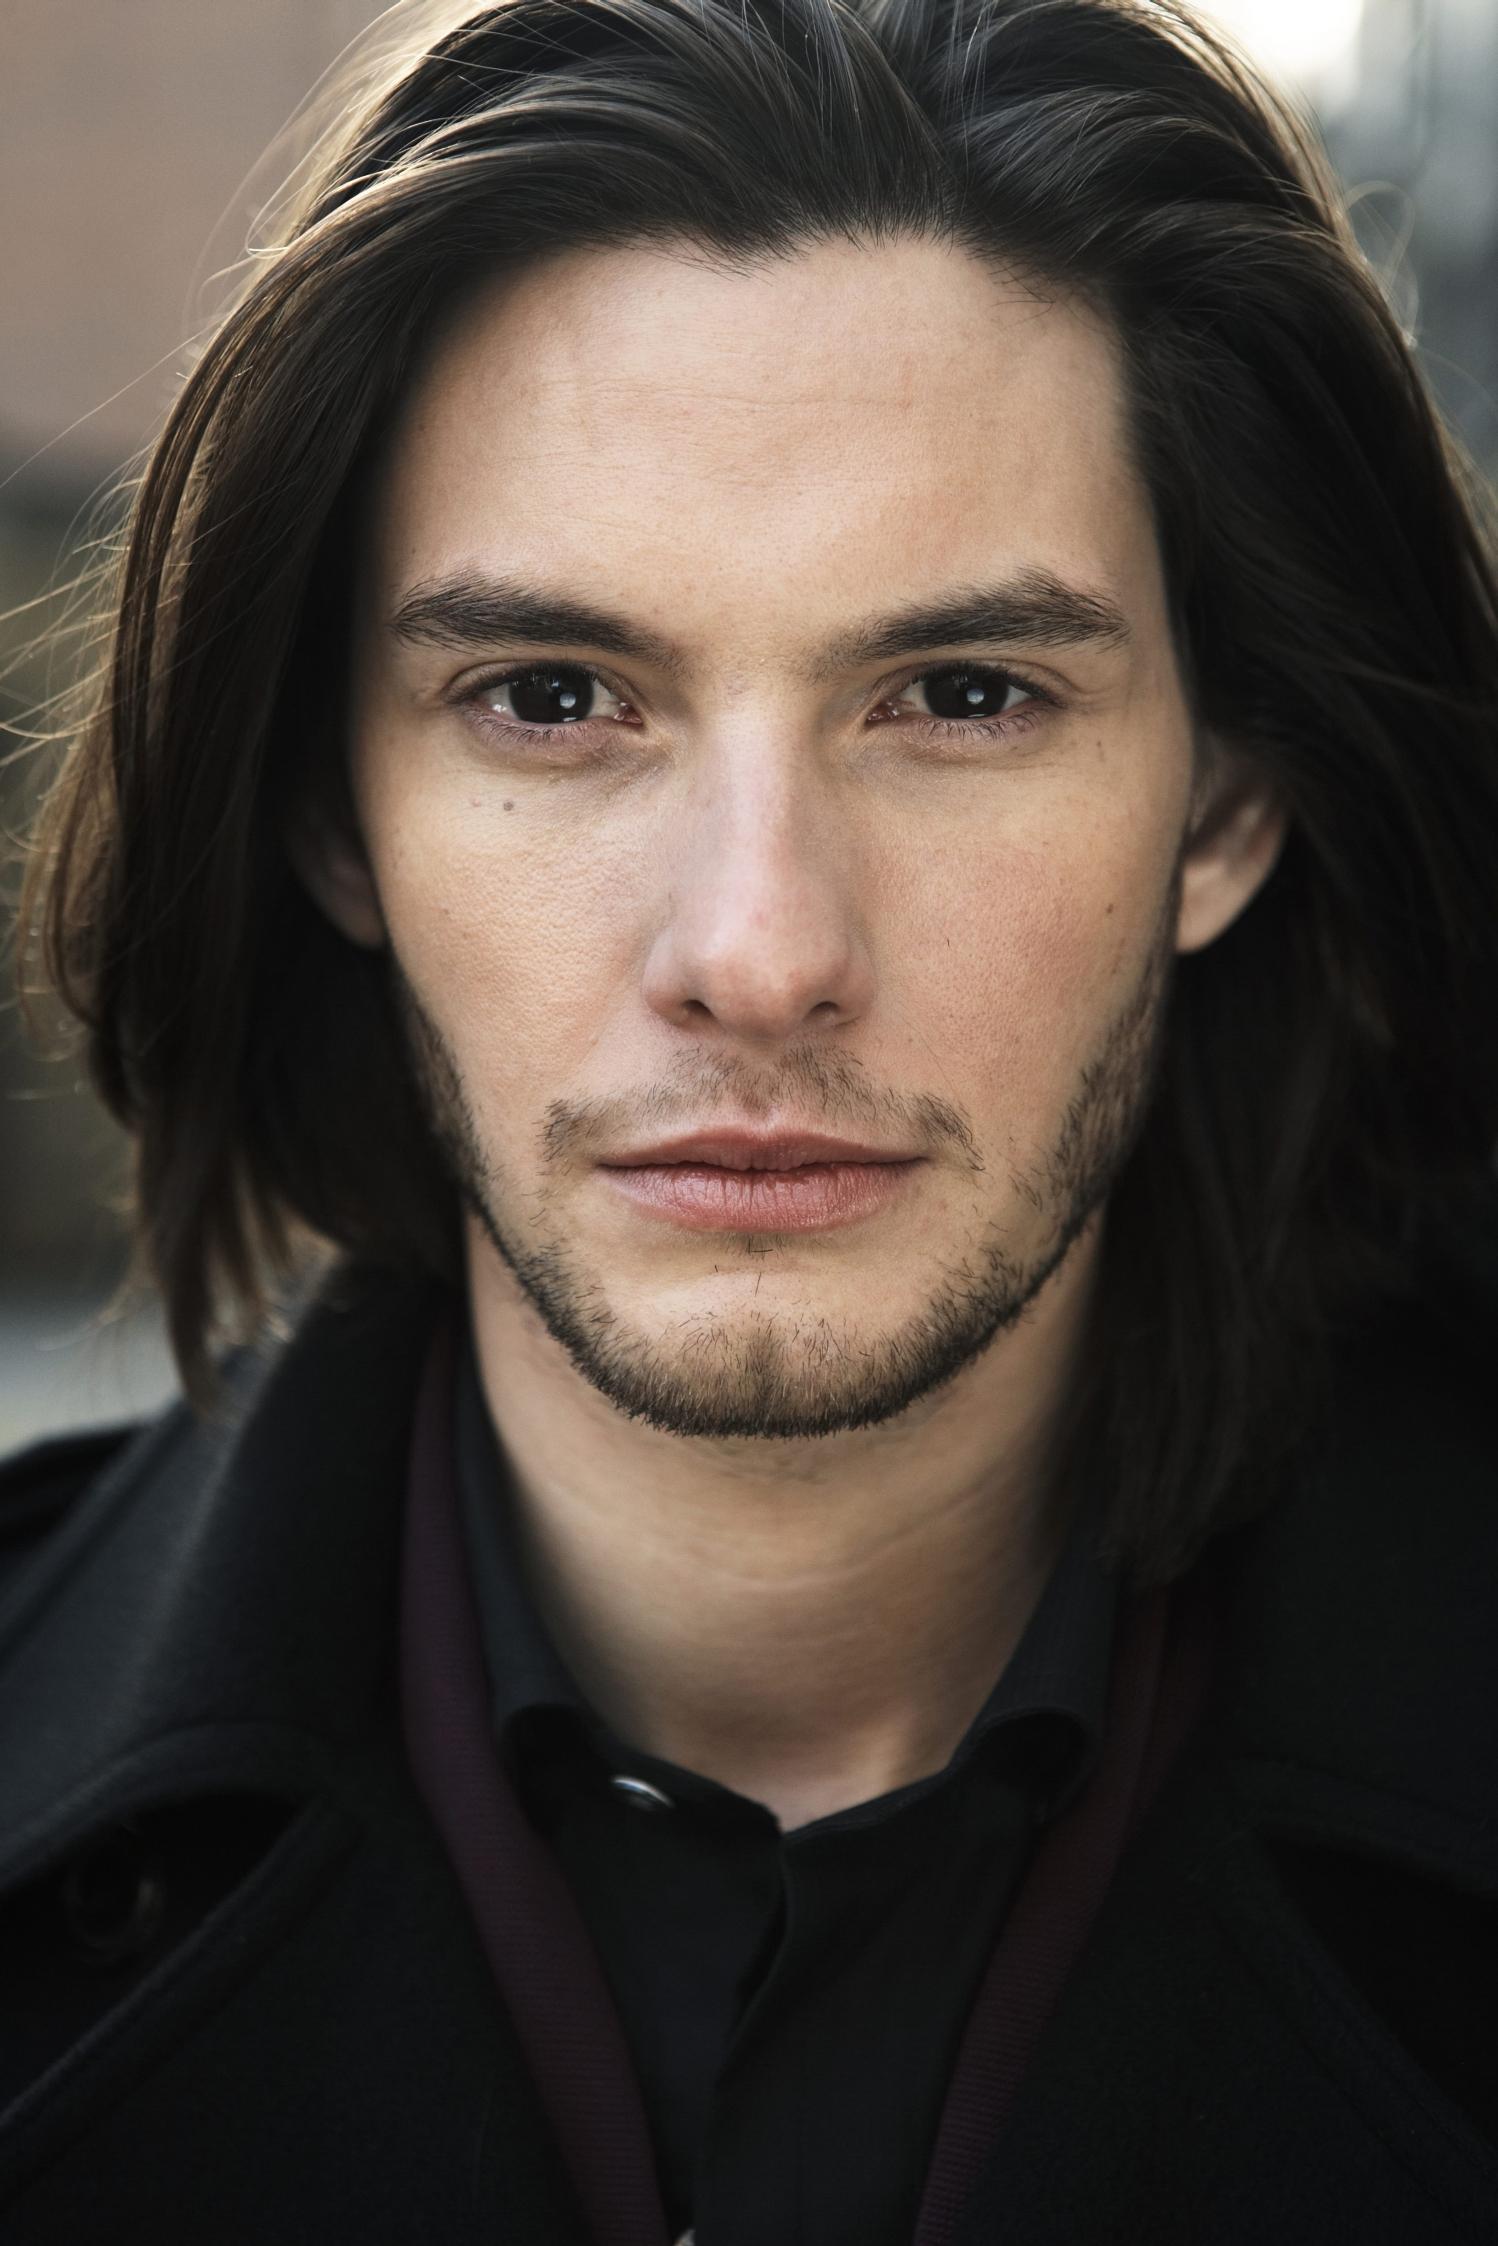 Poze Ben Barnes - Actor - Poza 41 din 98 - CineMagia.ro